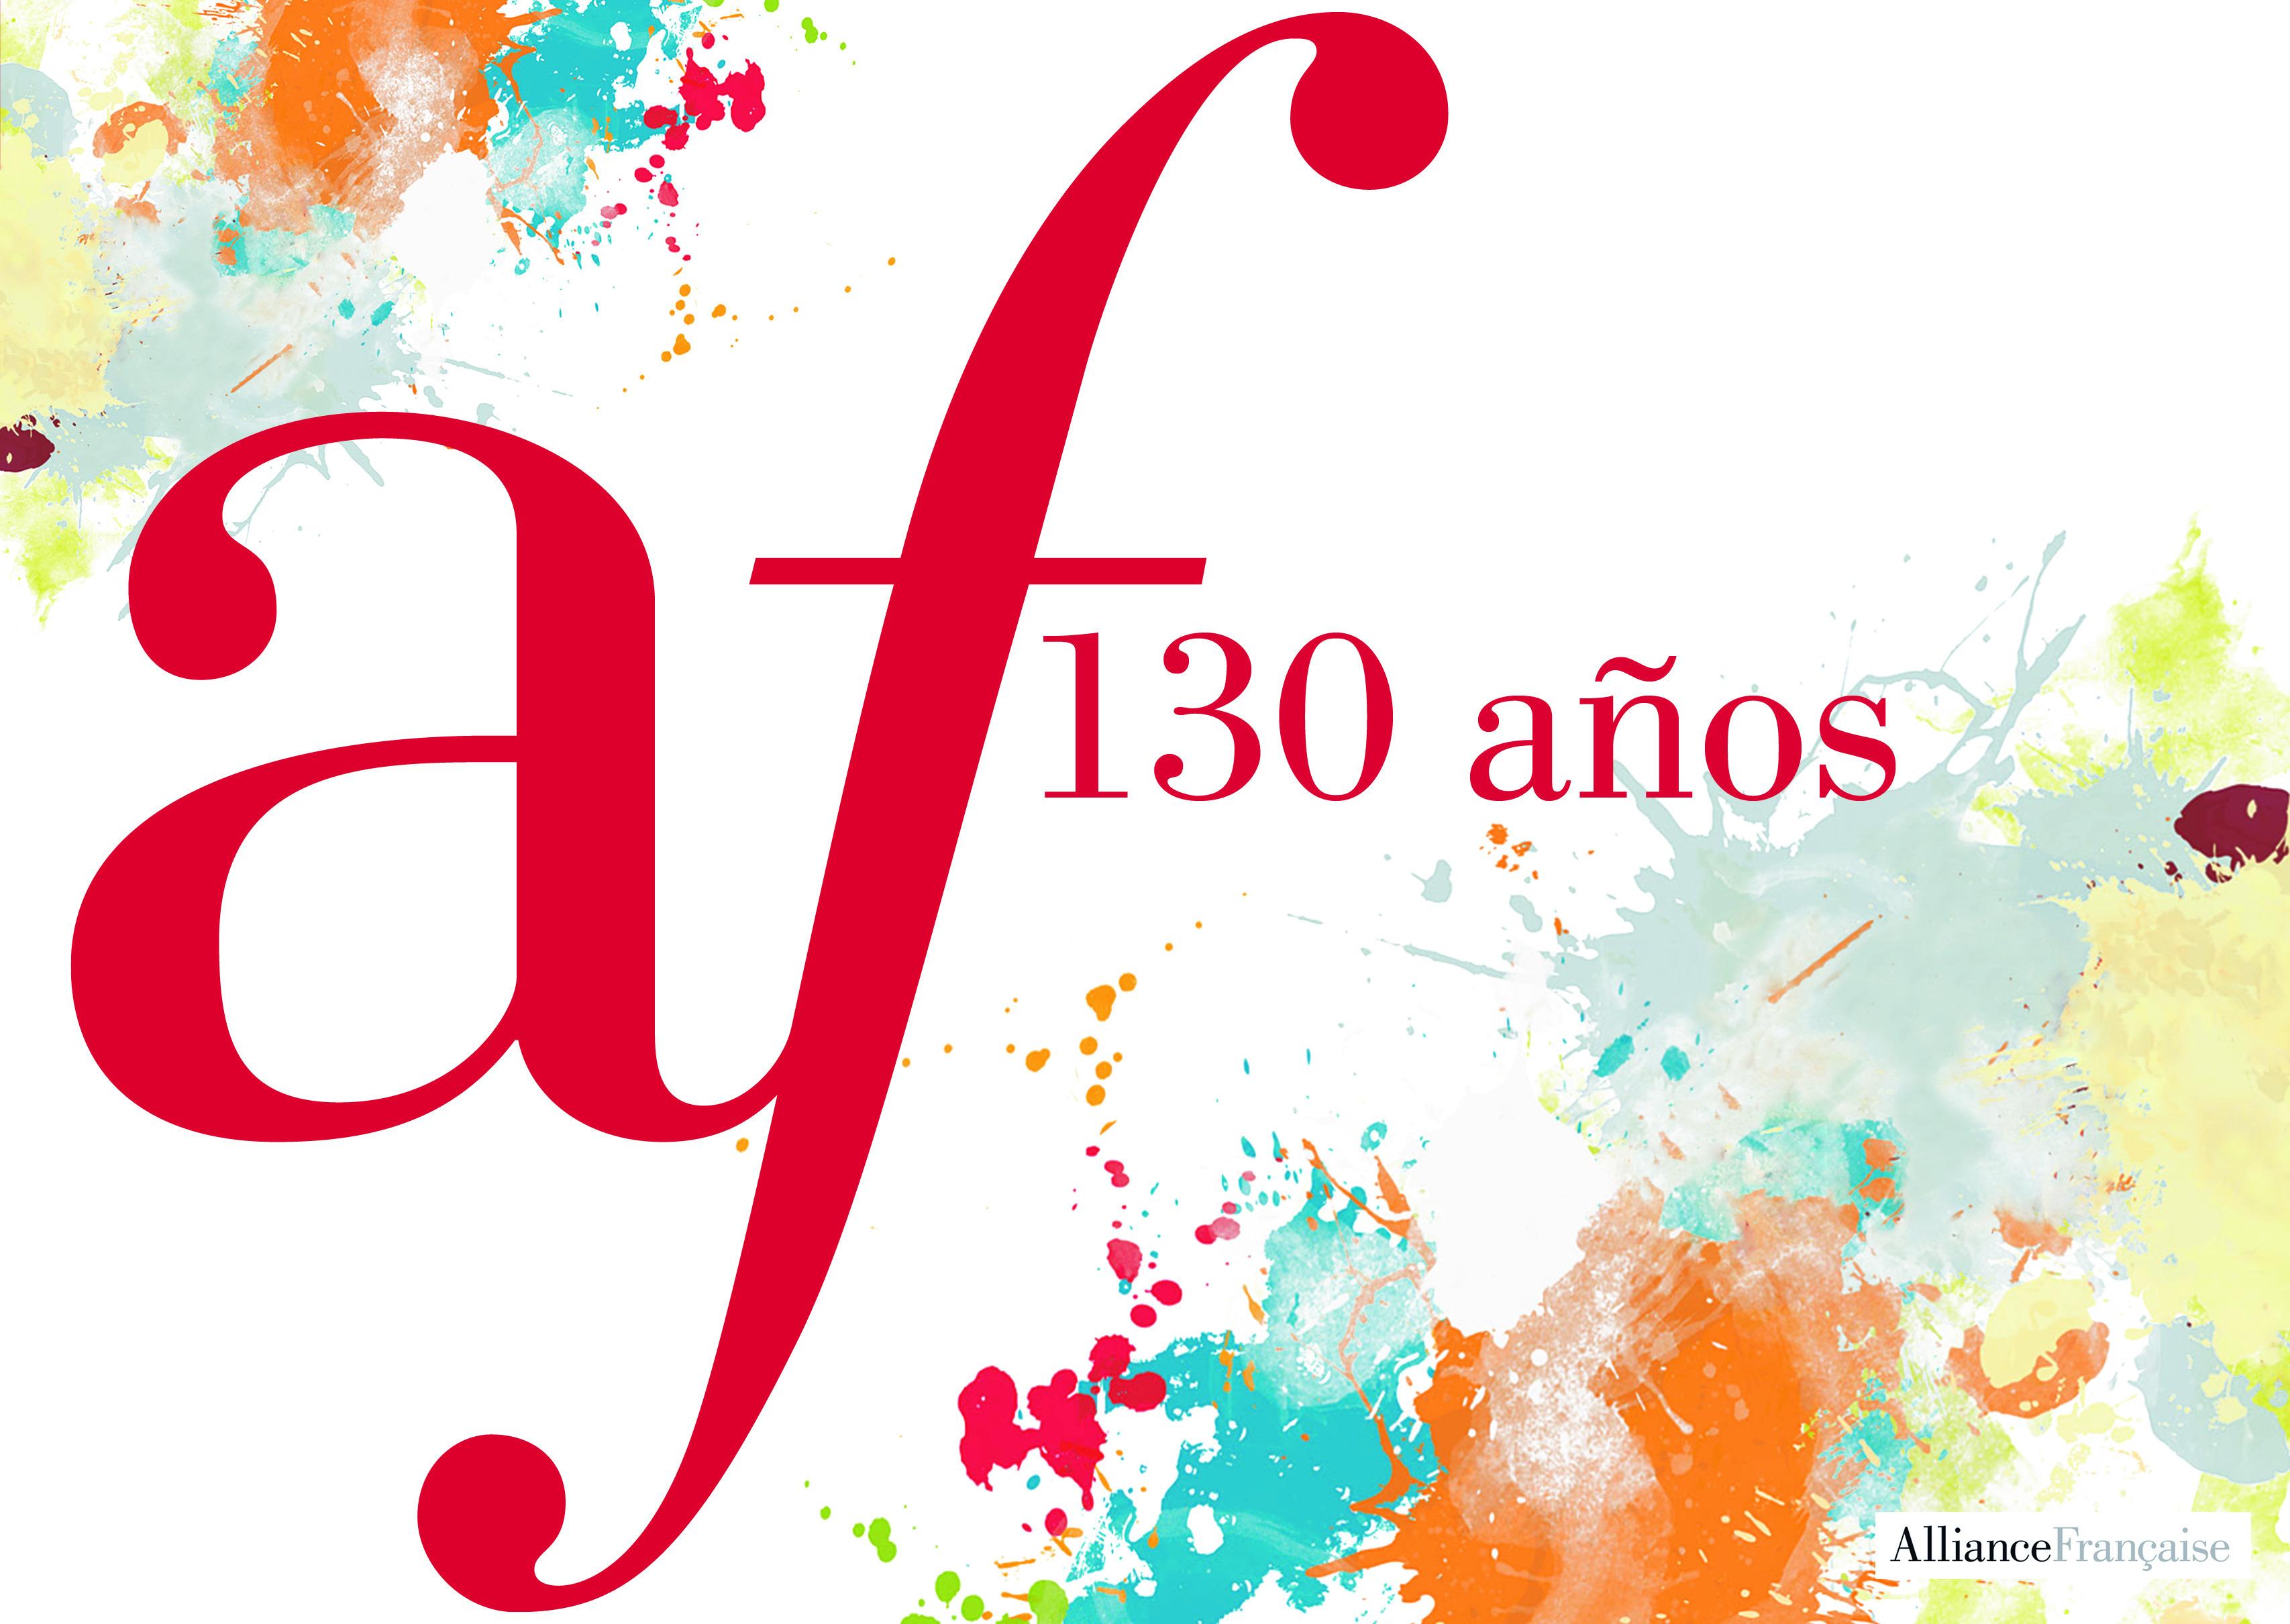 Alliance Française Alliance Française 130 años